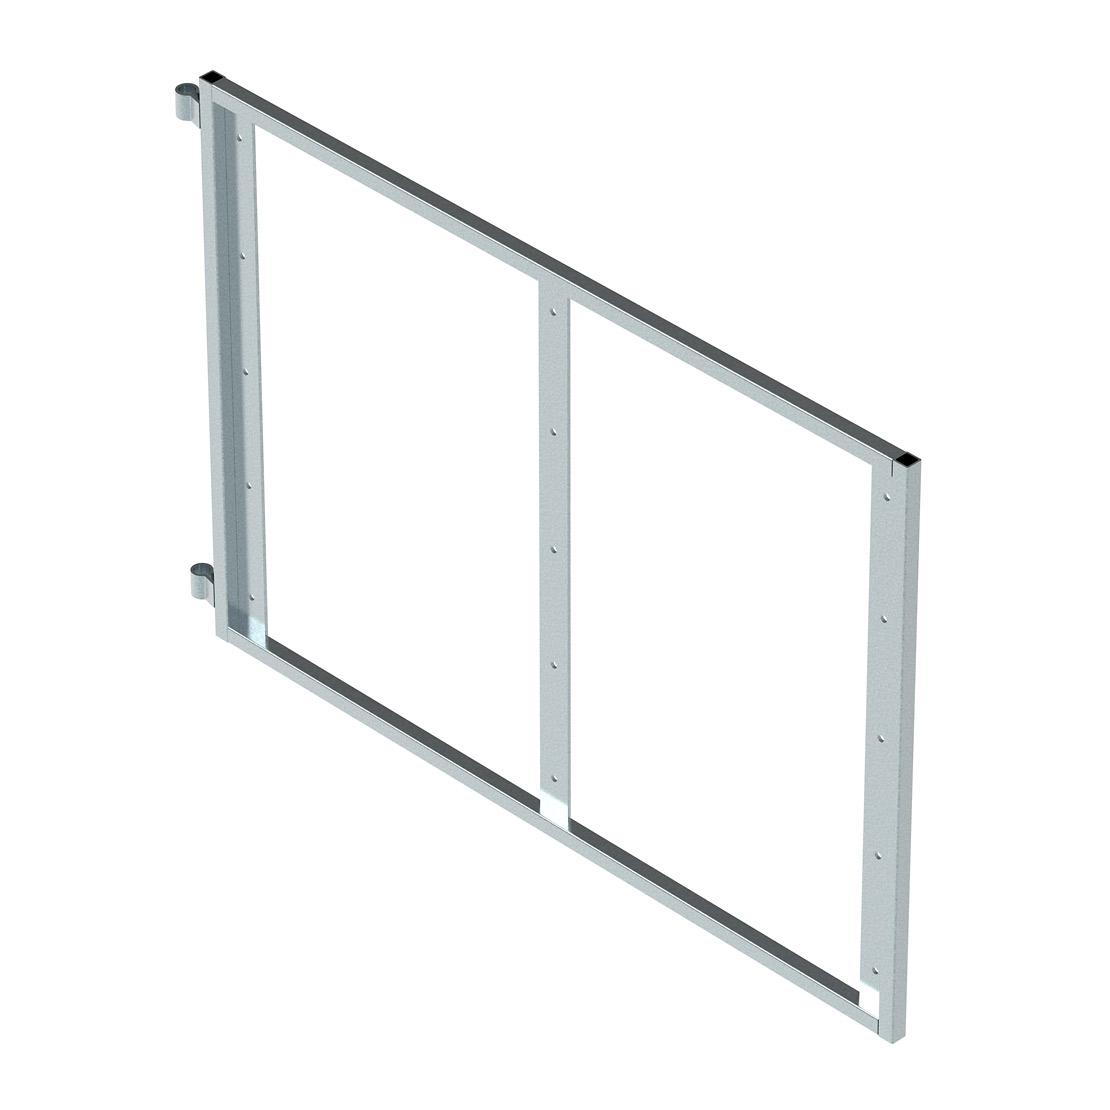 Sheepyard gate 1200mm x 850mm (frame only)